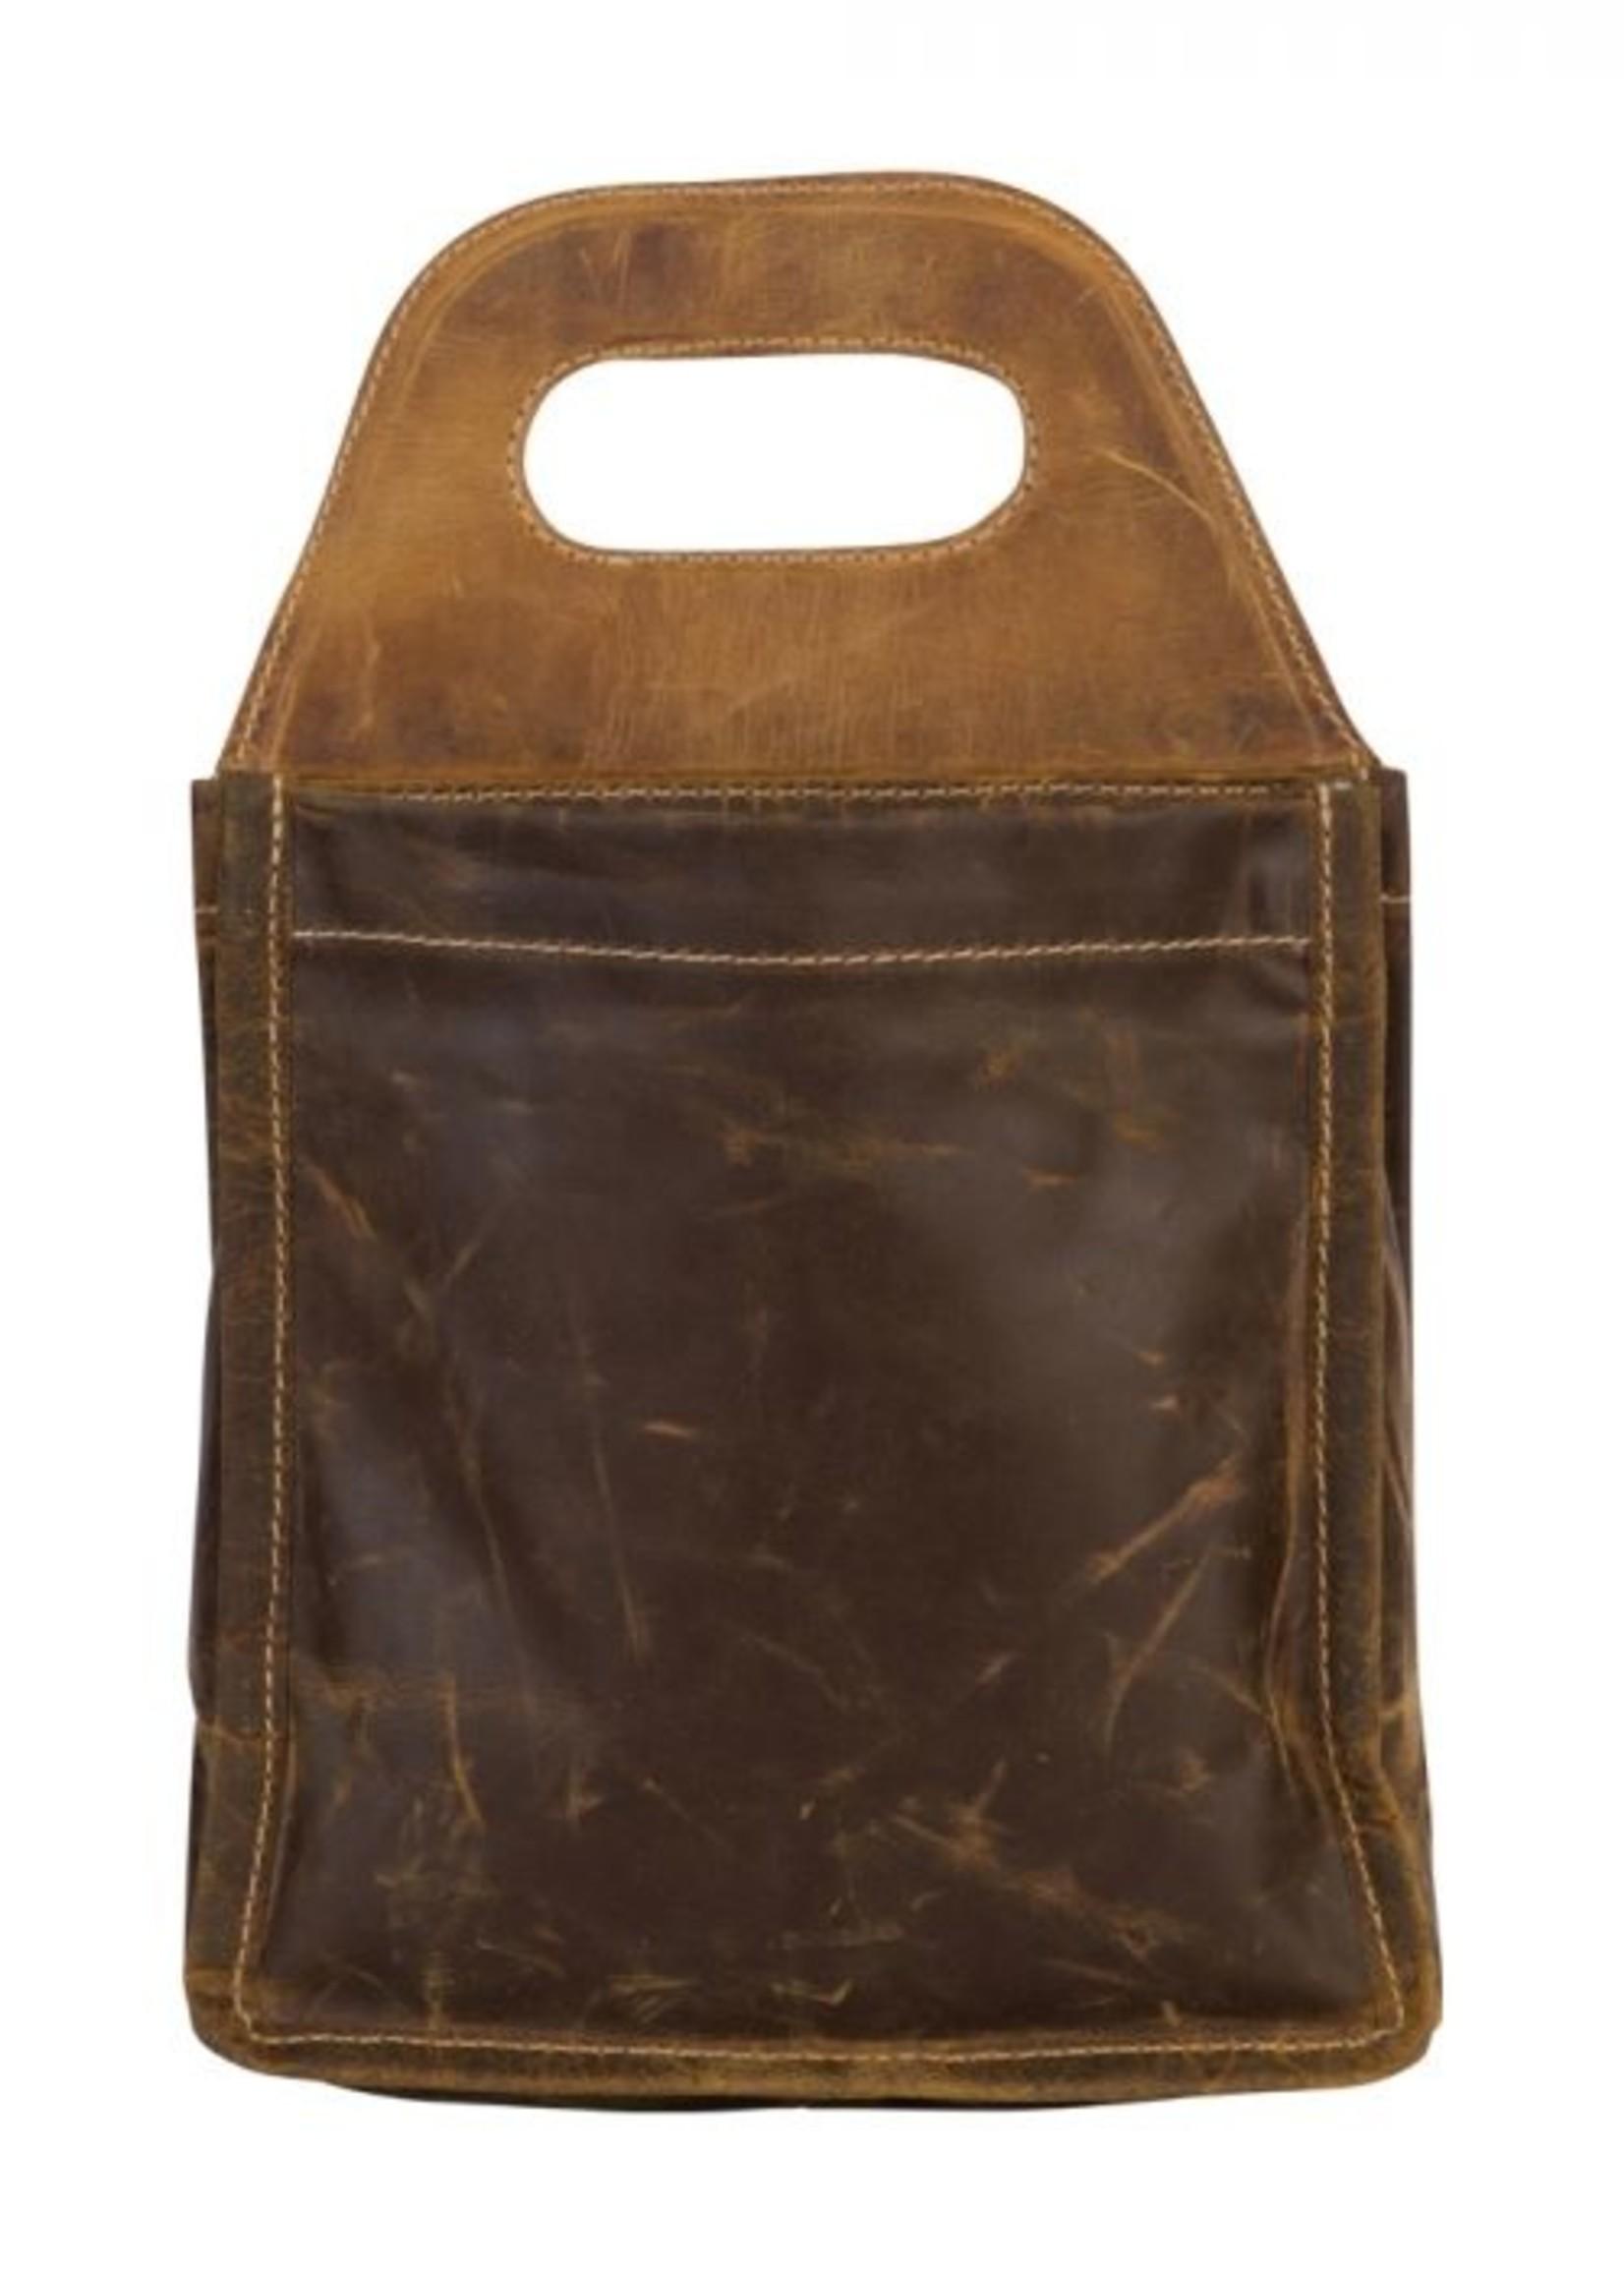 Date Palm 6 Pack Caddy